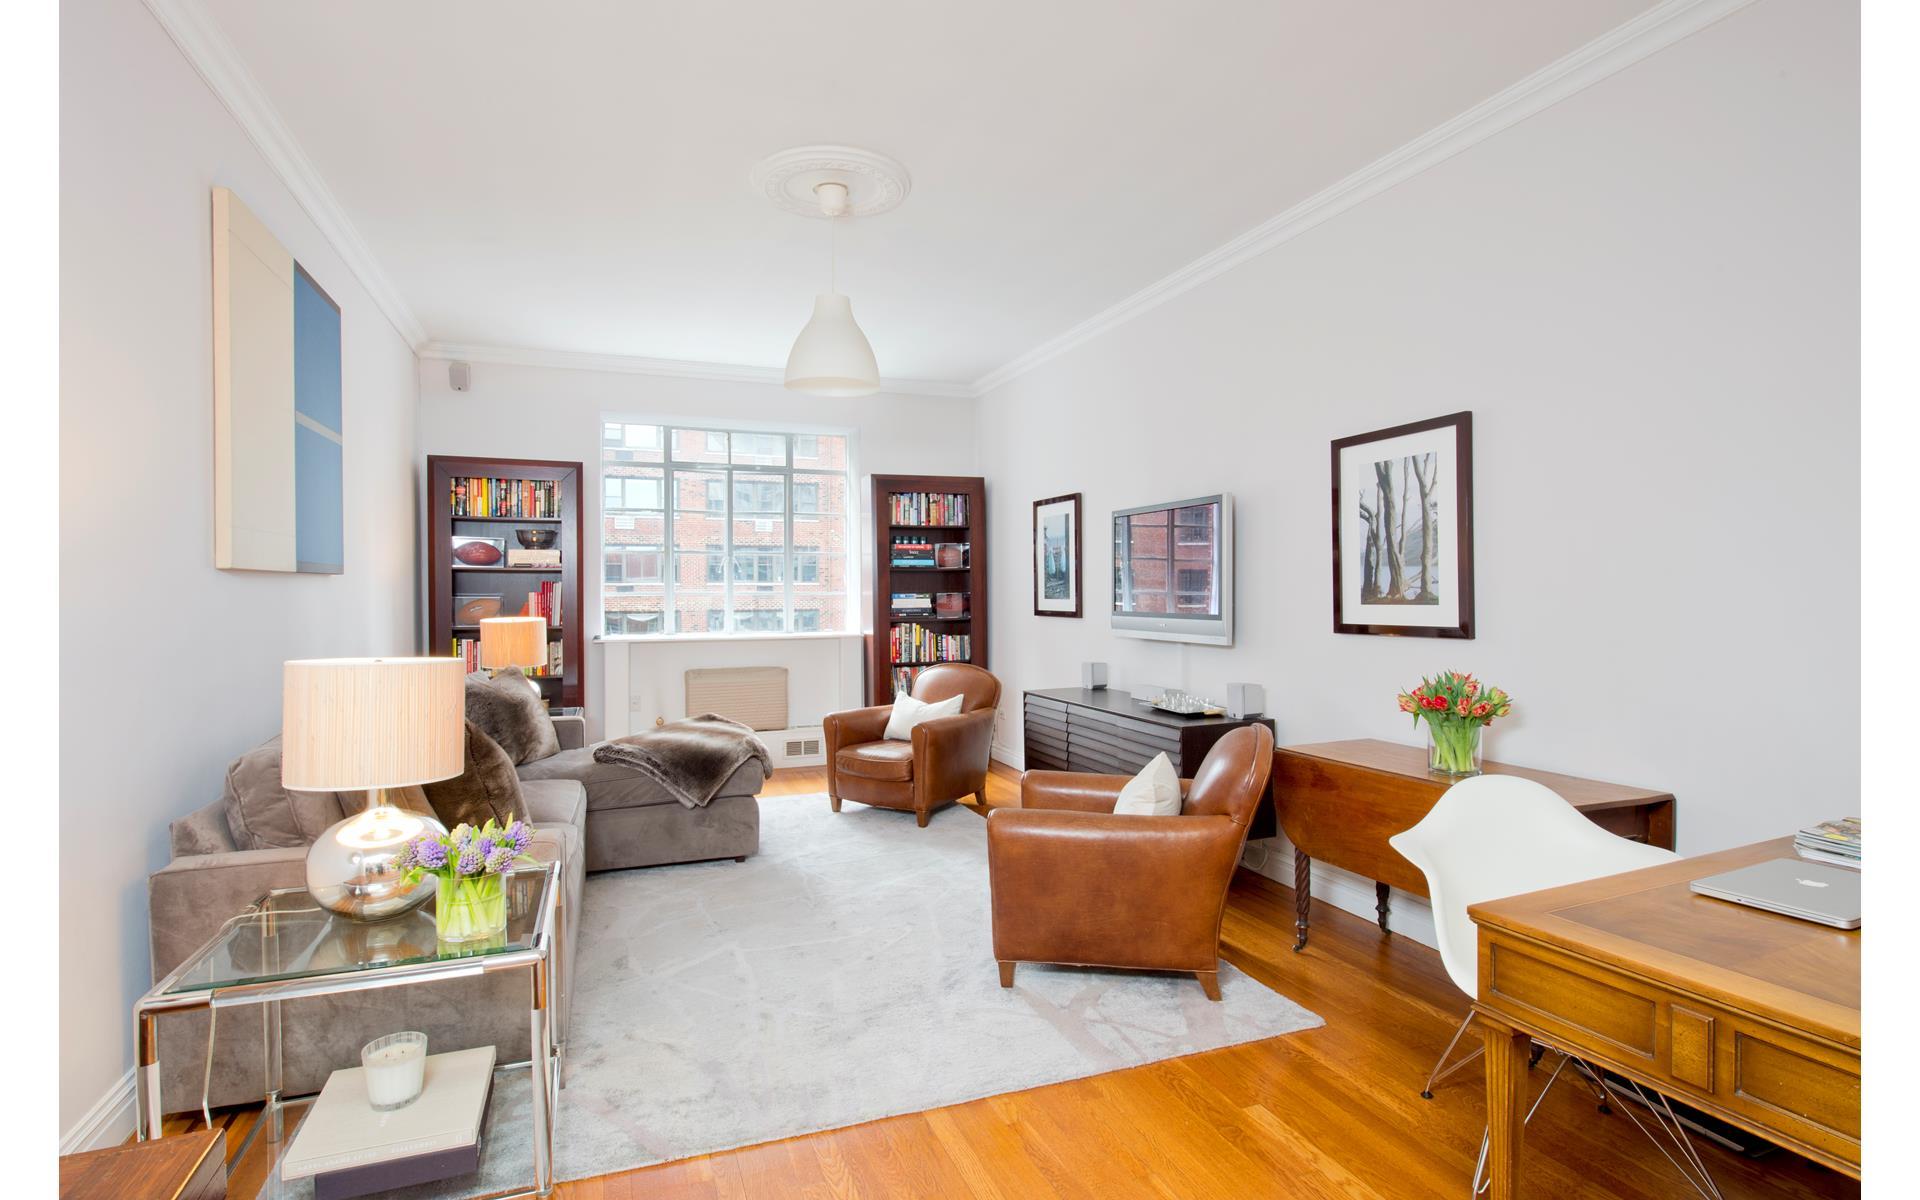 Living Room 86 St 519 e 86 st tenants, 519 east 86th street, 6a - upper east side